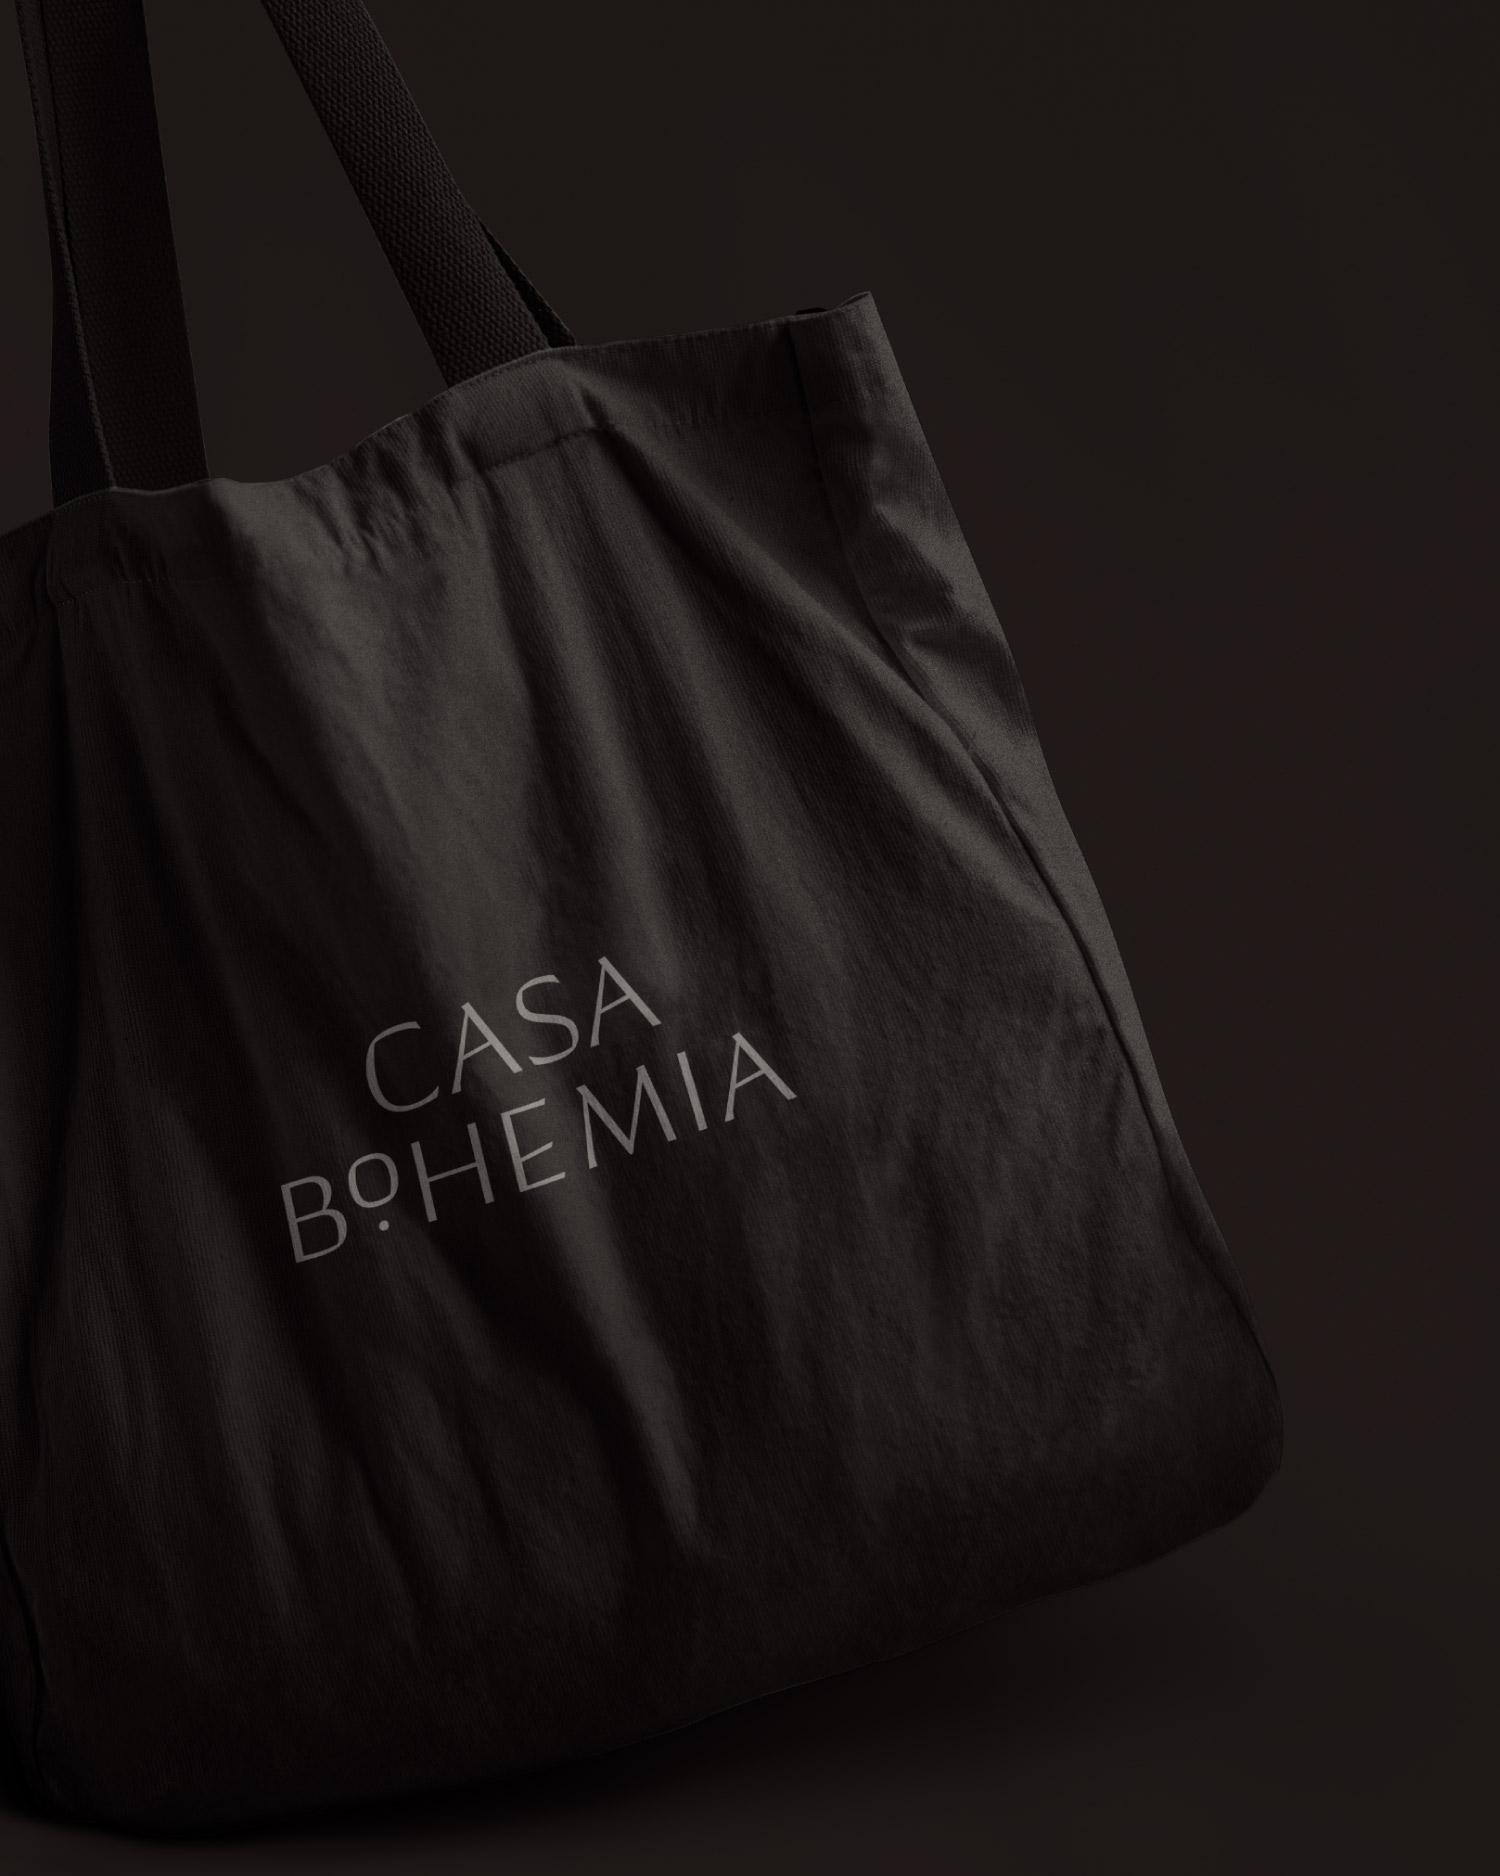 Black tote with Casa Bohemia logo